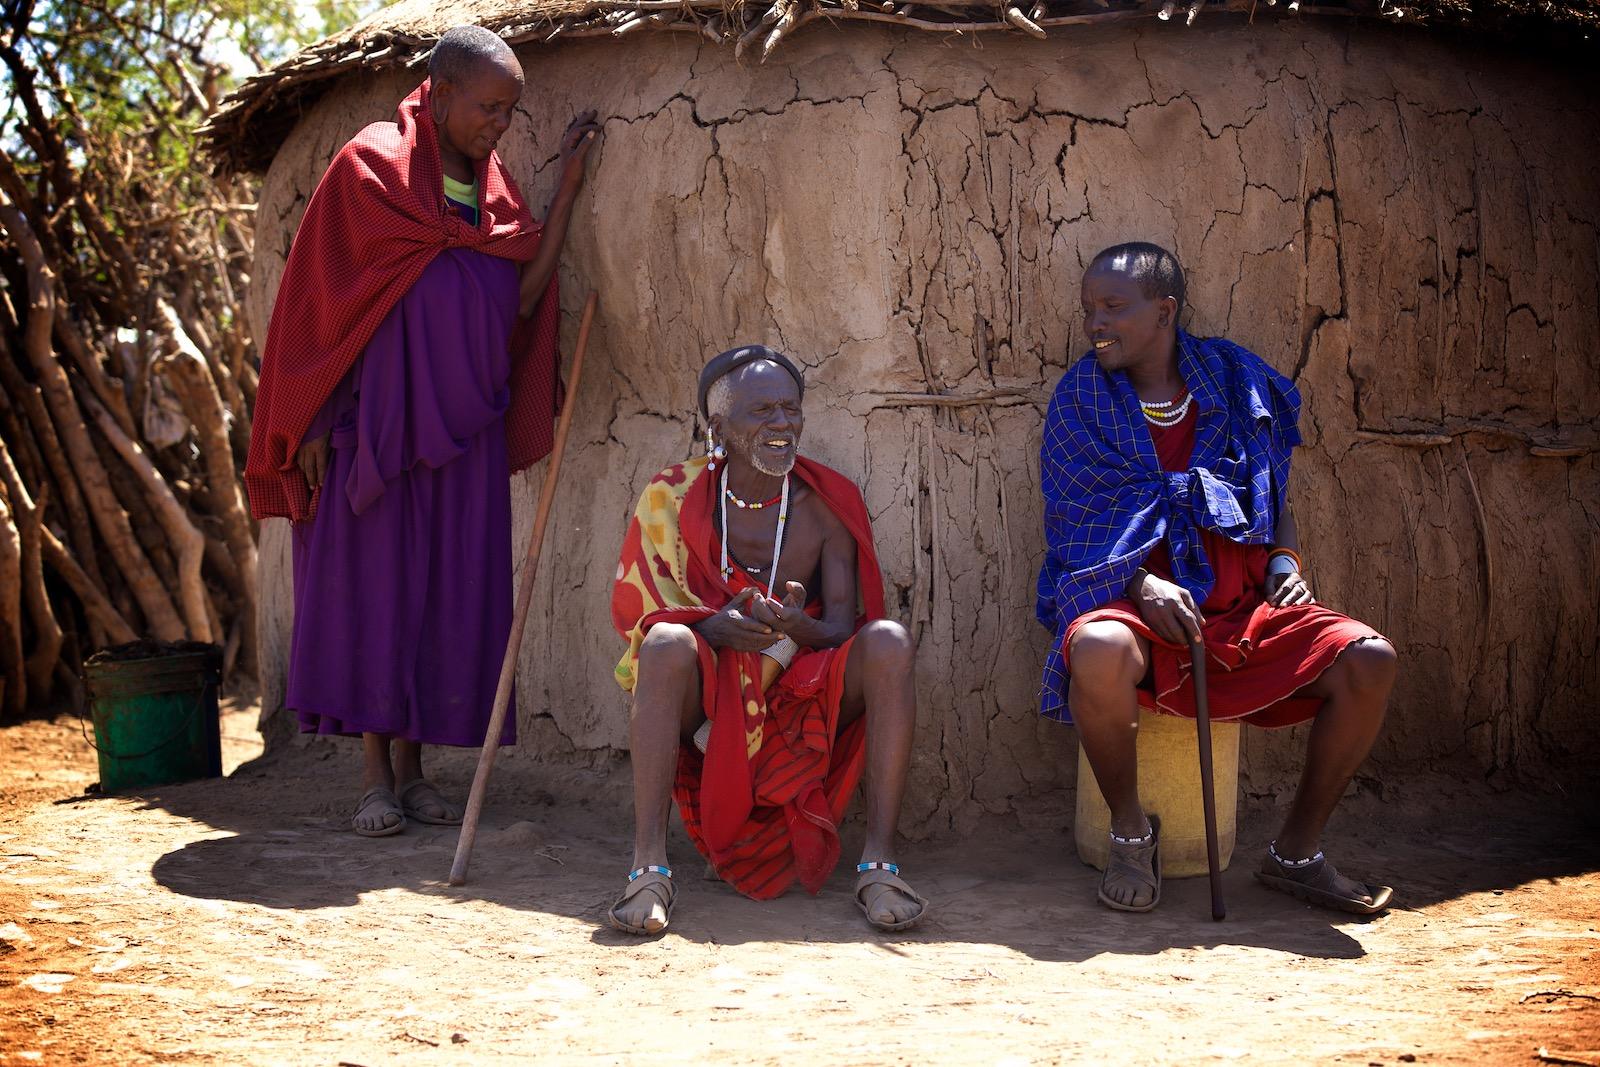 Masai-landsby i Tanzania